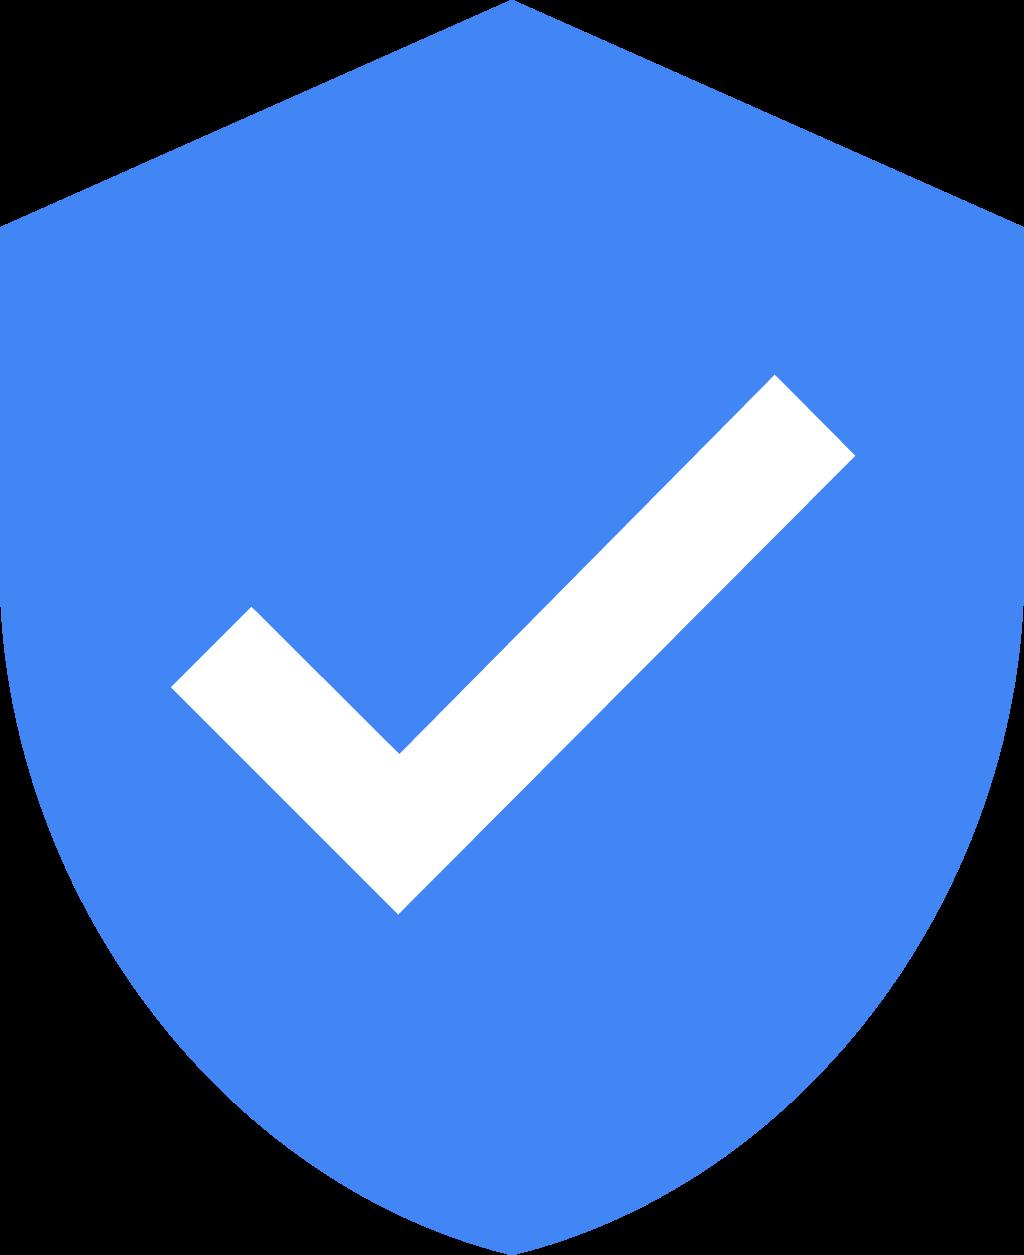 google-verified-icon